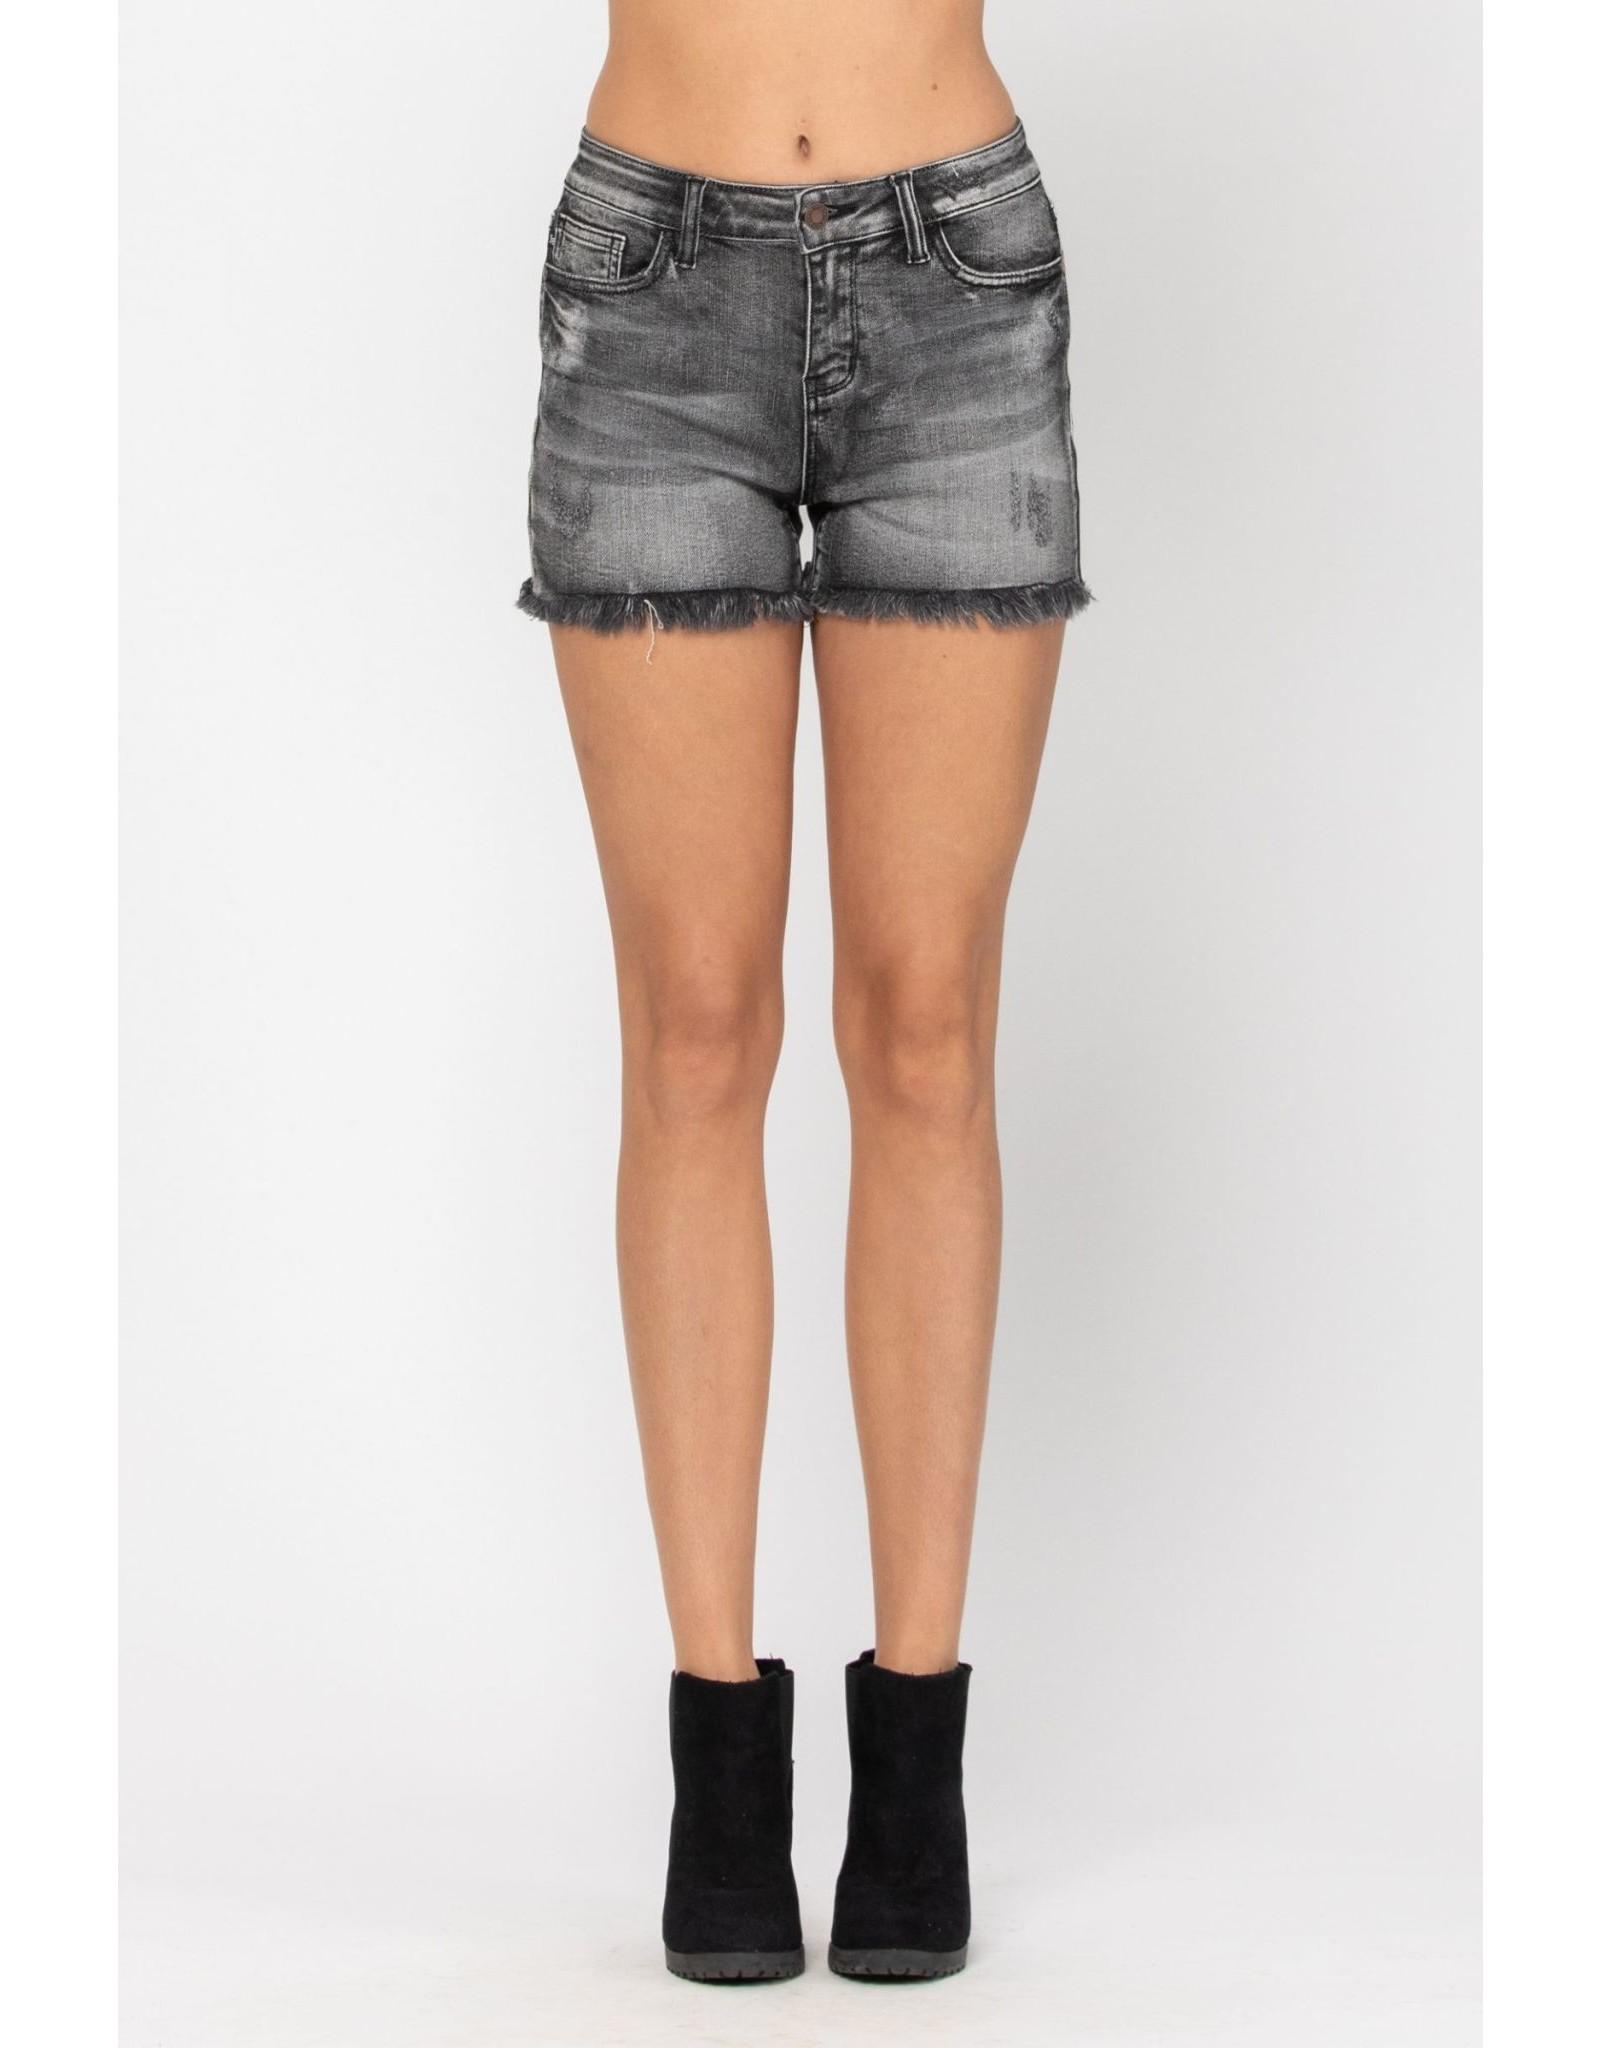 Blaire Fray Hem Shorts